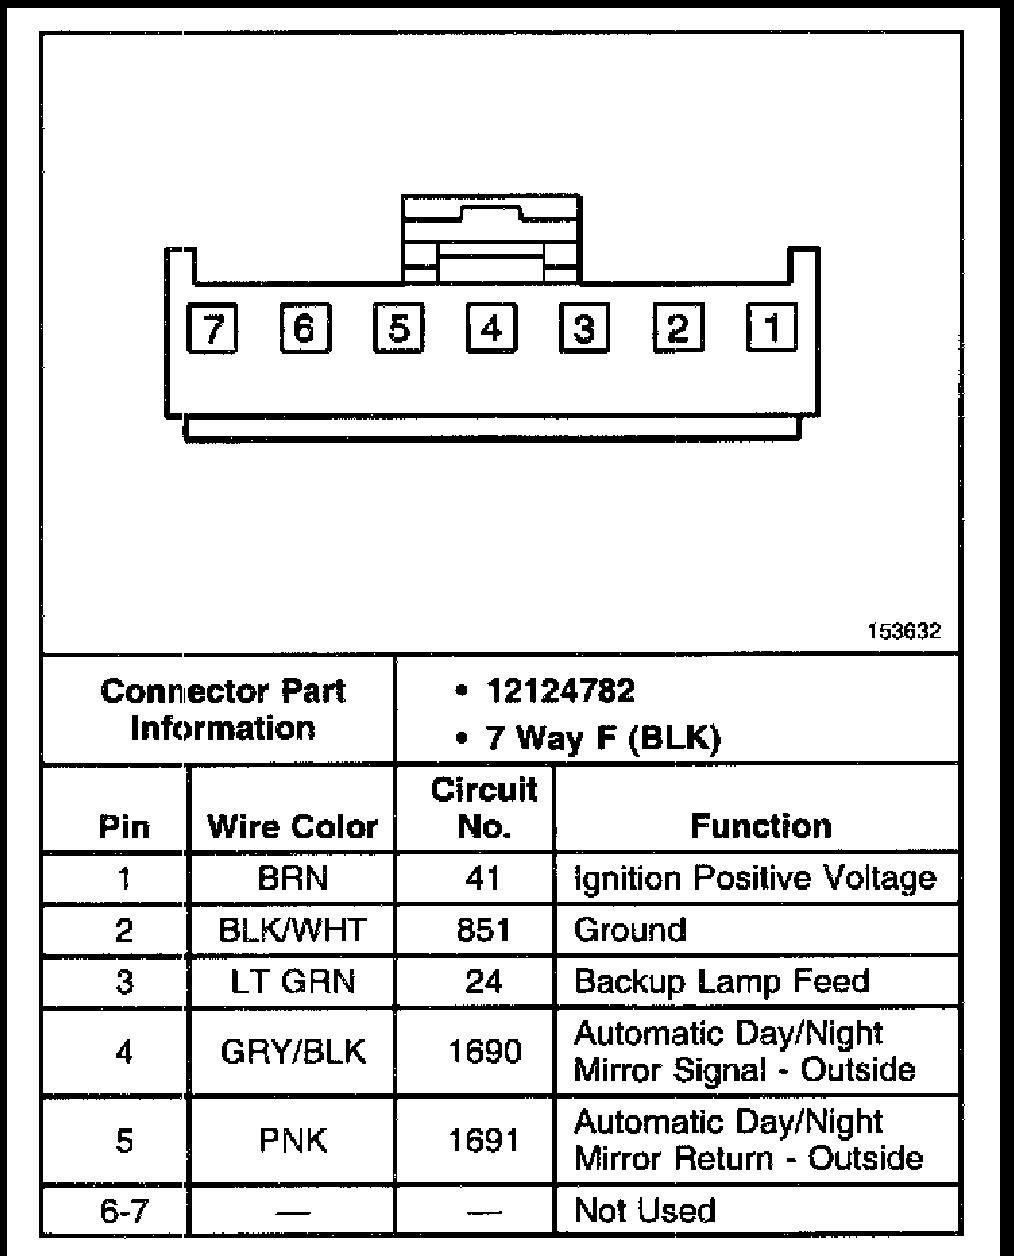 Awesome Gentex 511 Wiring Diagram Wiring Diagram G9 Wiring Cloud Uslyletkolfr09Org